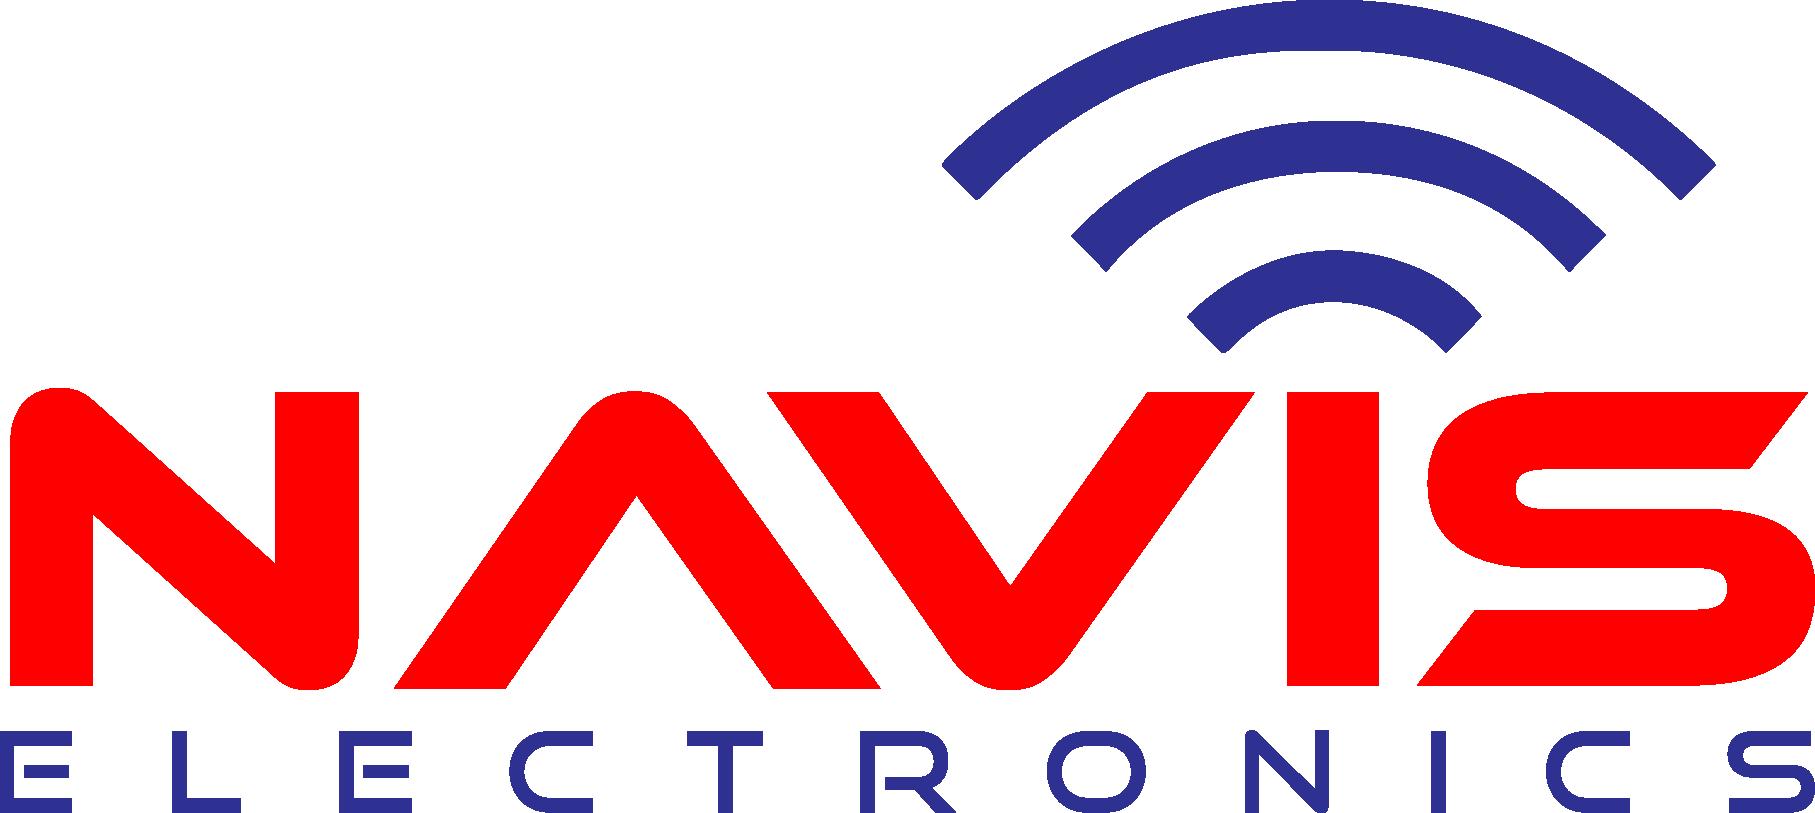 Navis Electronics